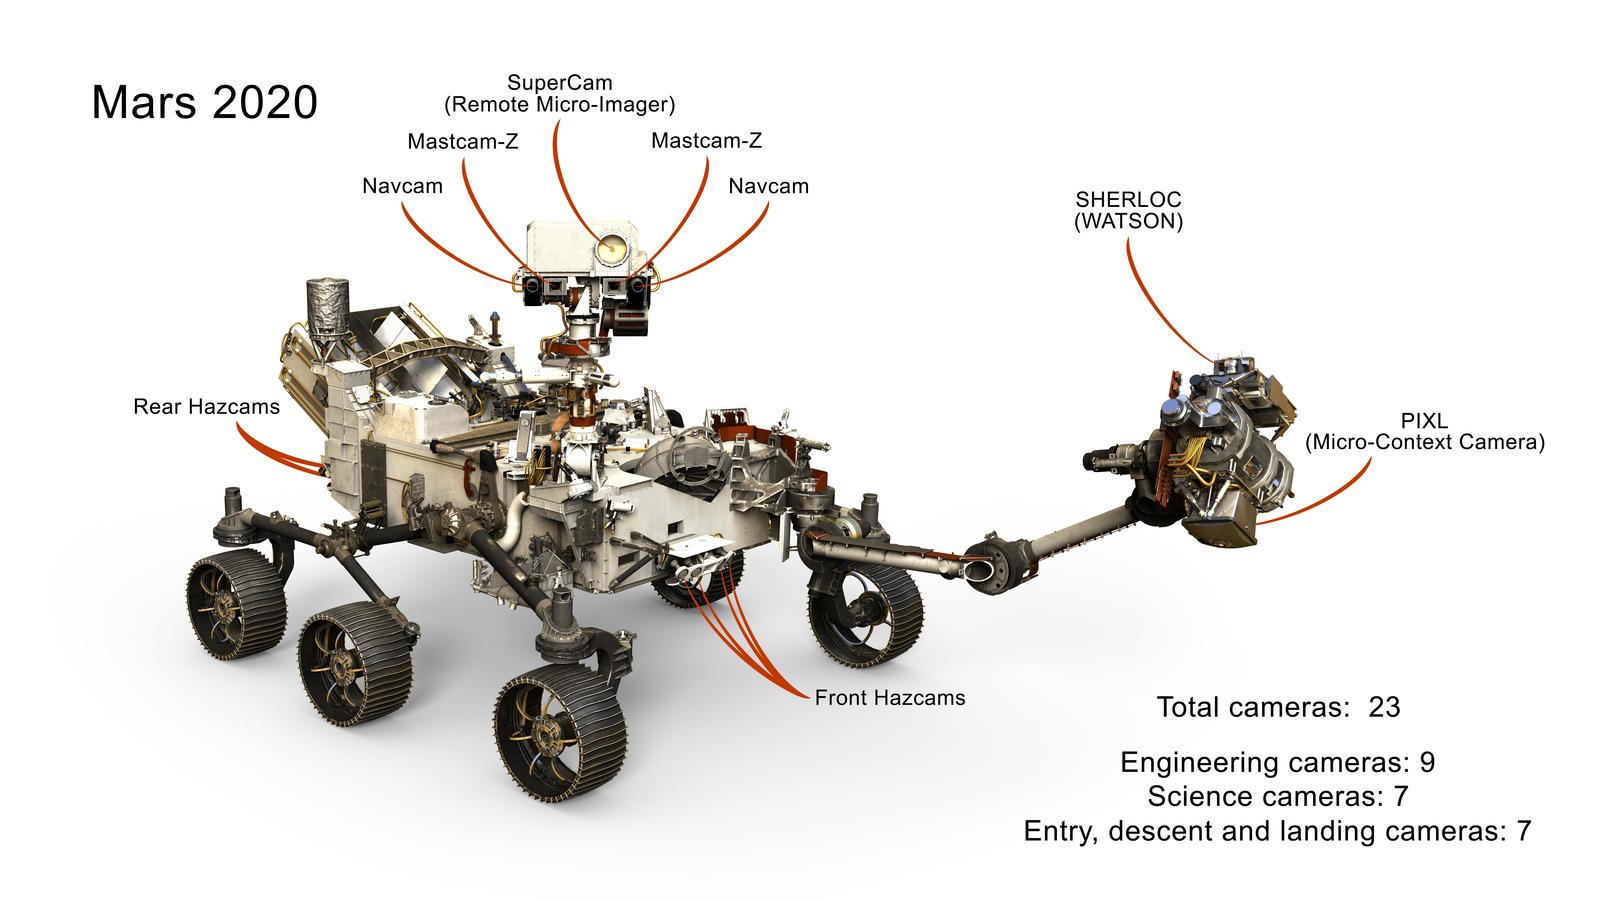 rover cameras nasa mars  next mars rover is first step toward